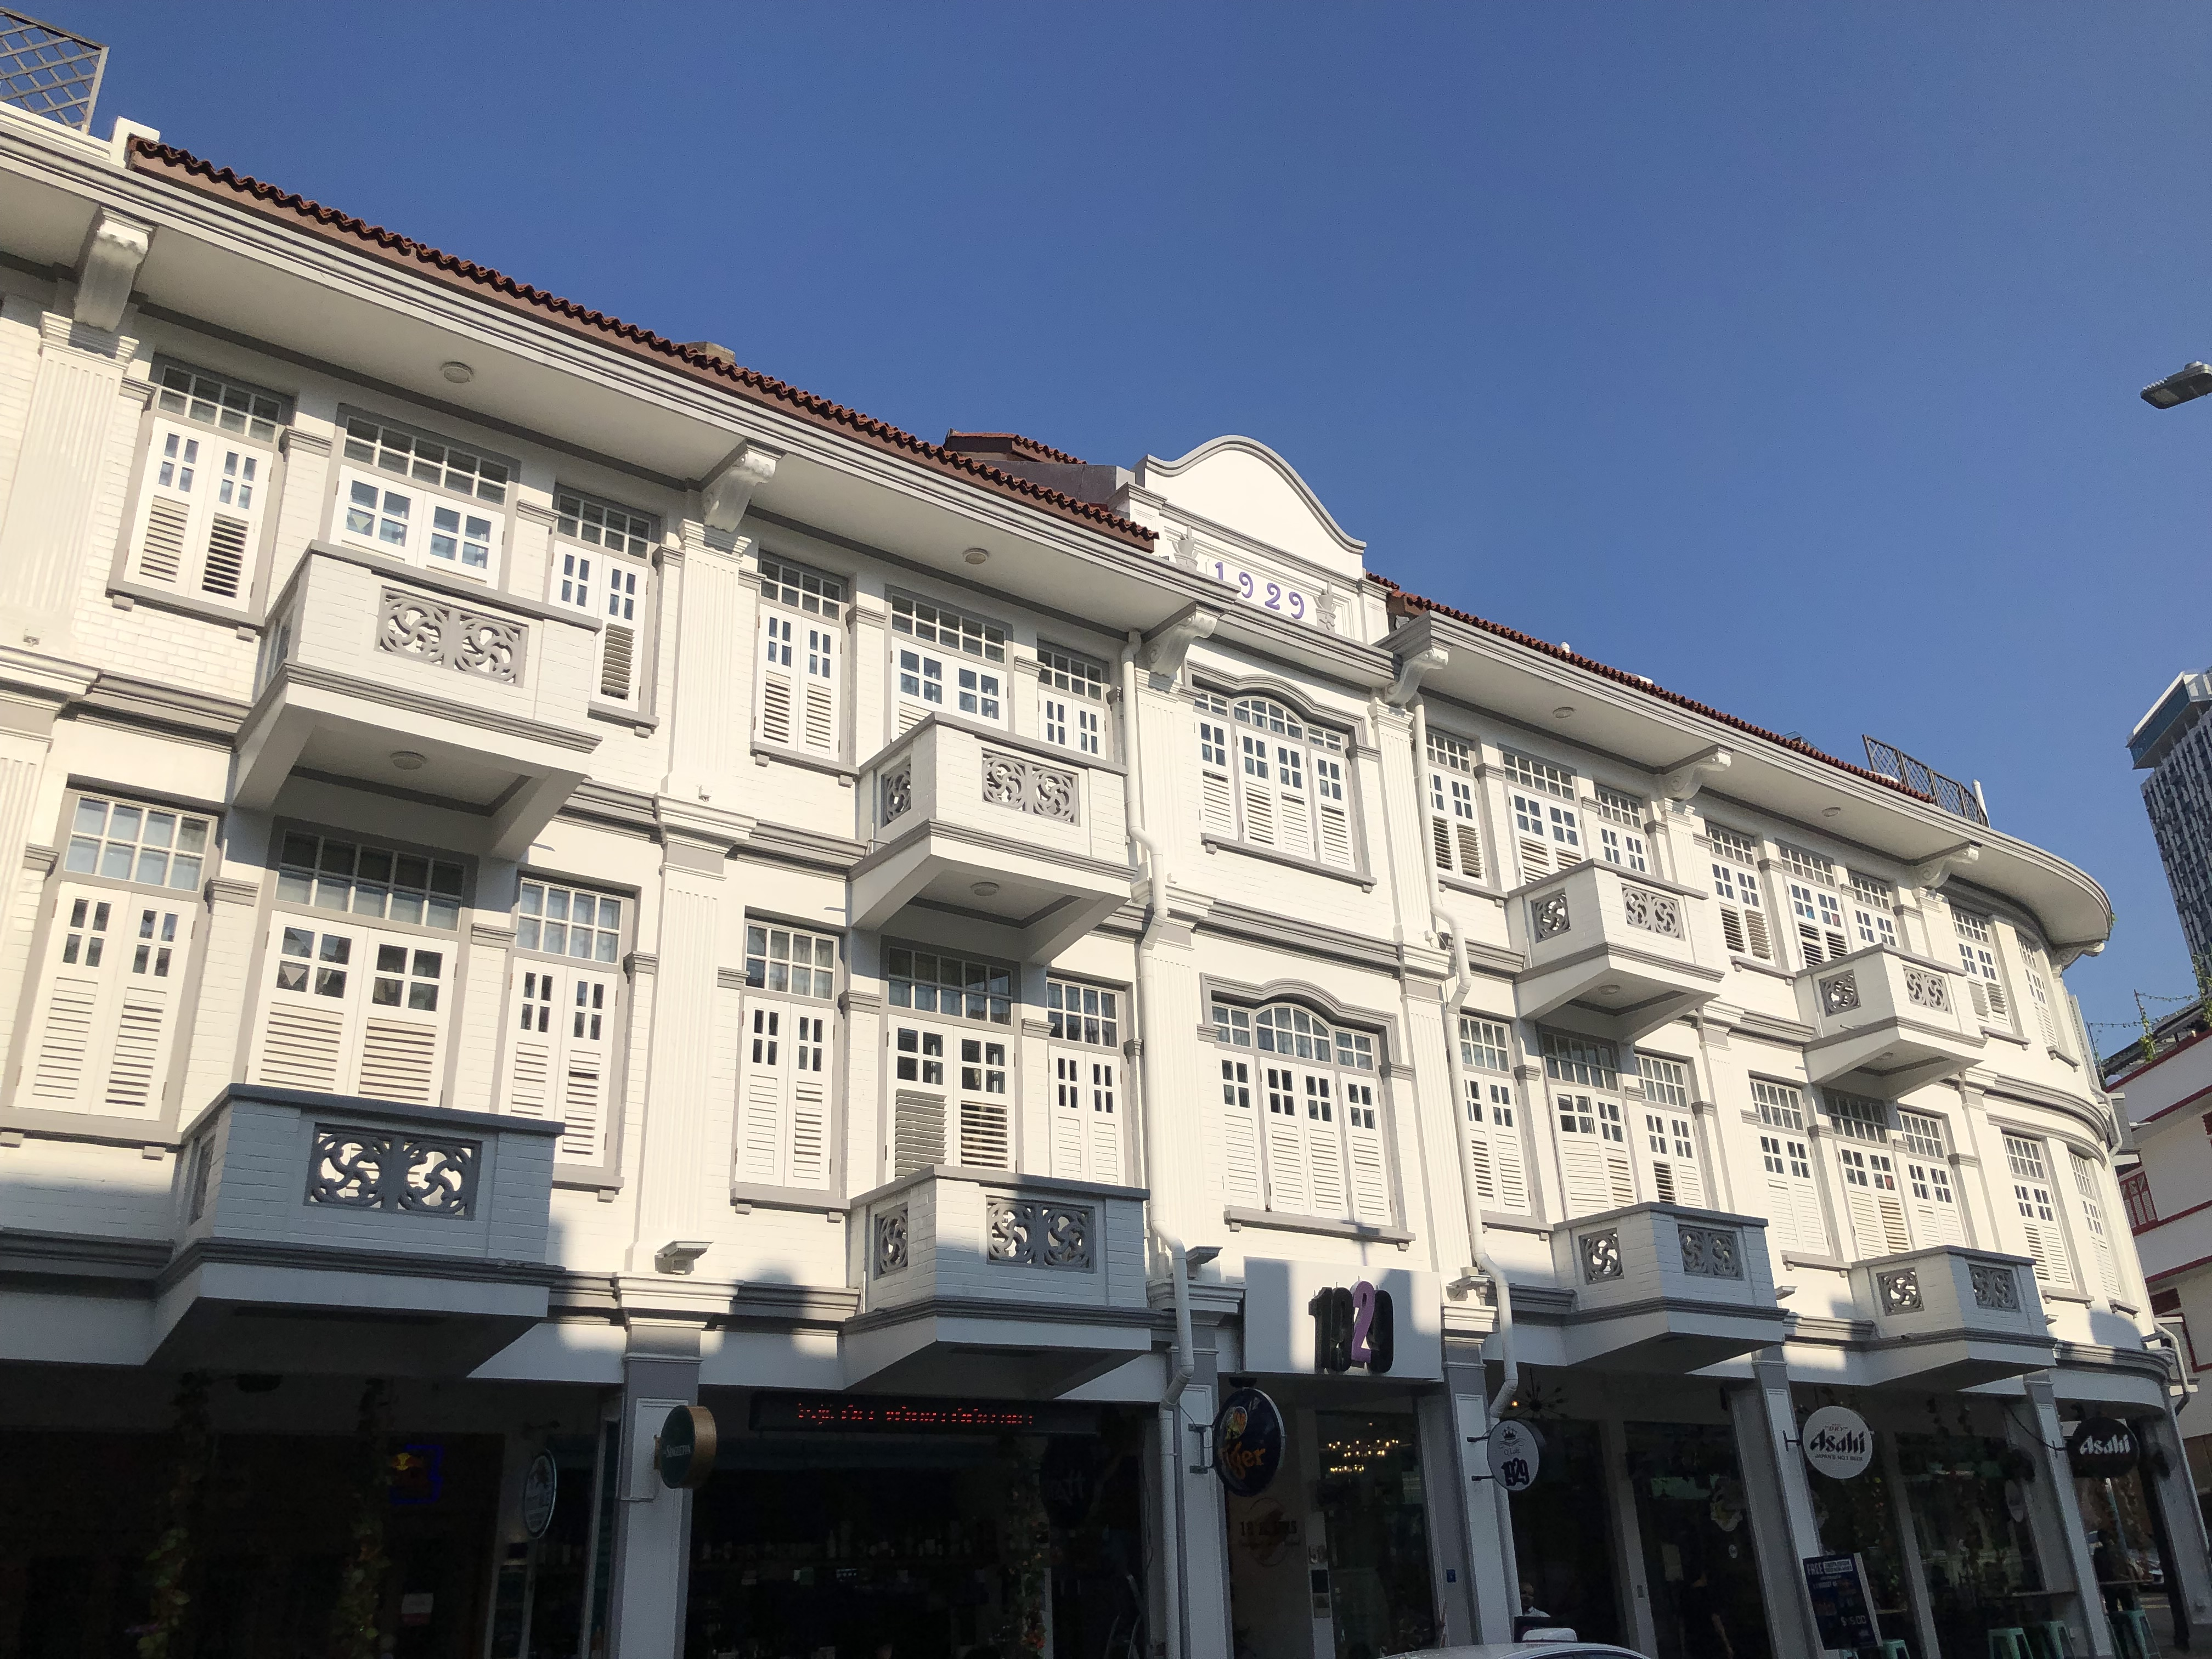 1929 Boutique Hotel